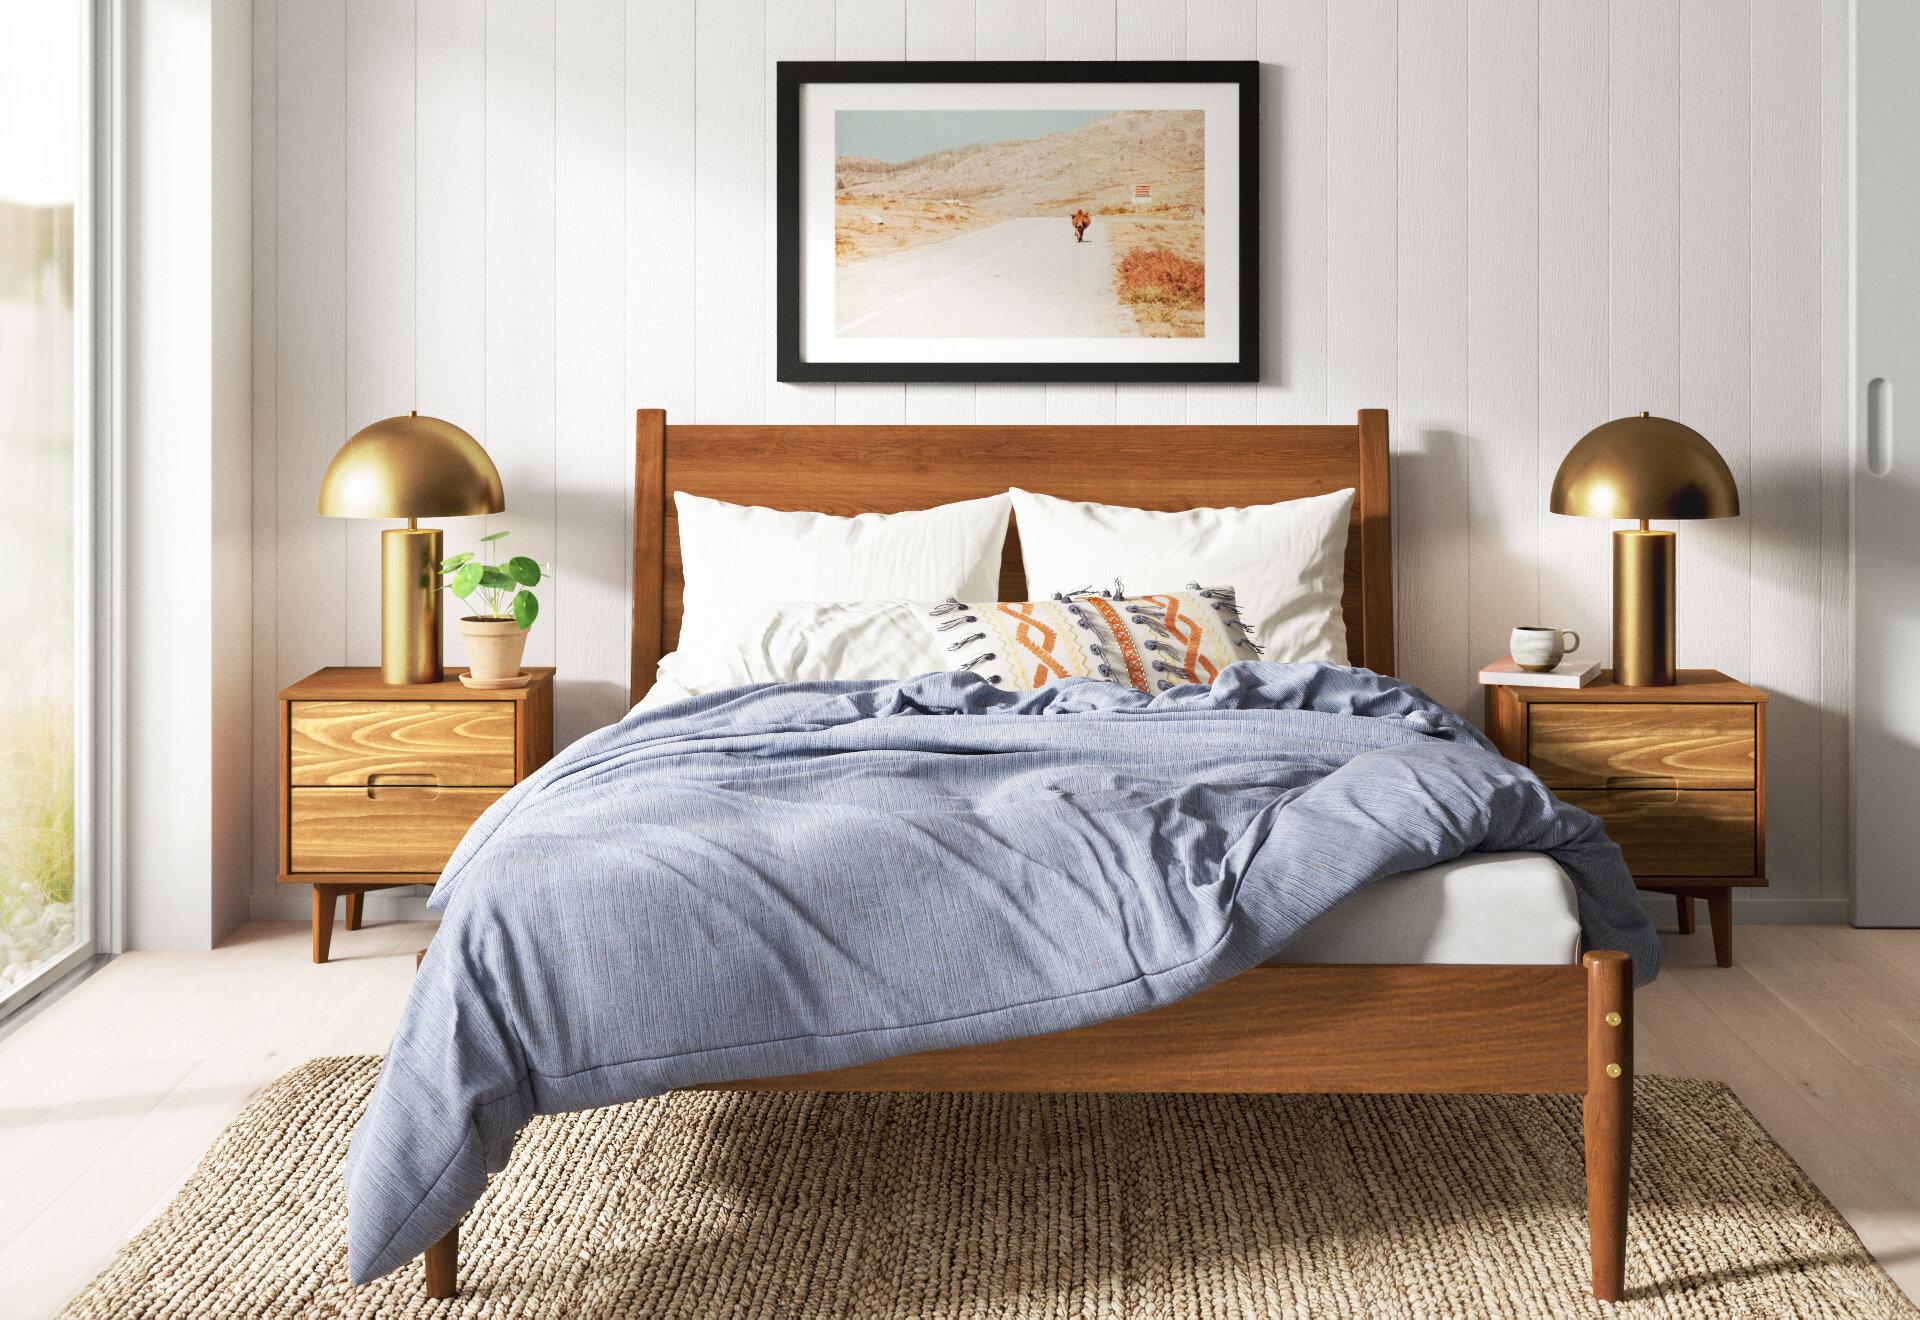 19 Incredibly Cool Modern Bedroom Ideas Allmodern